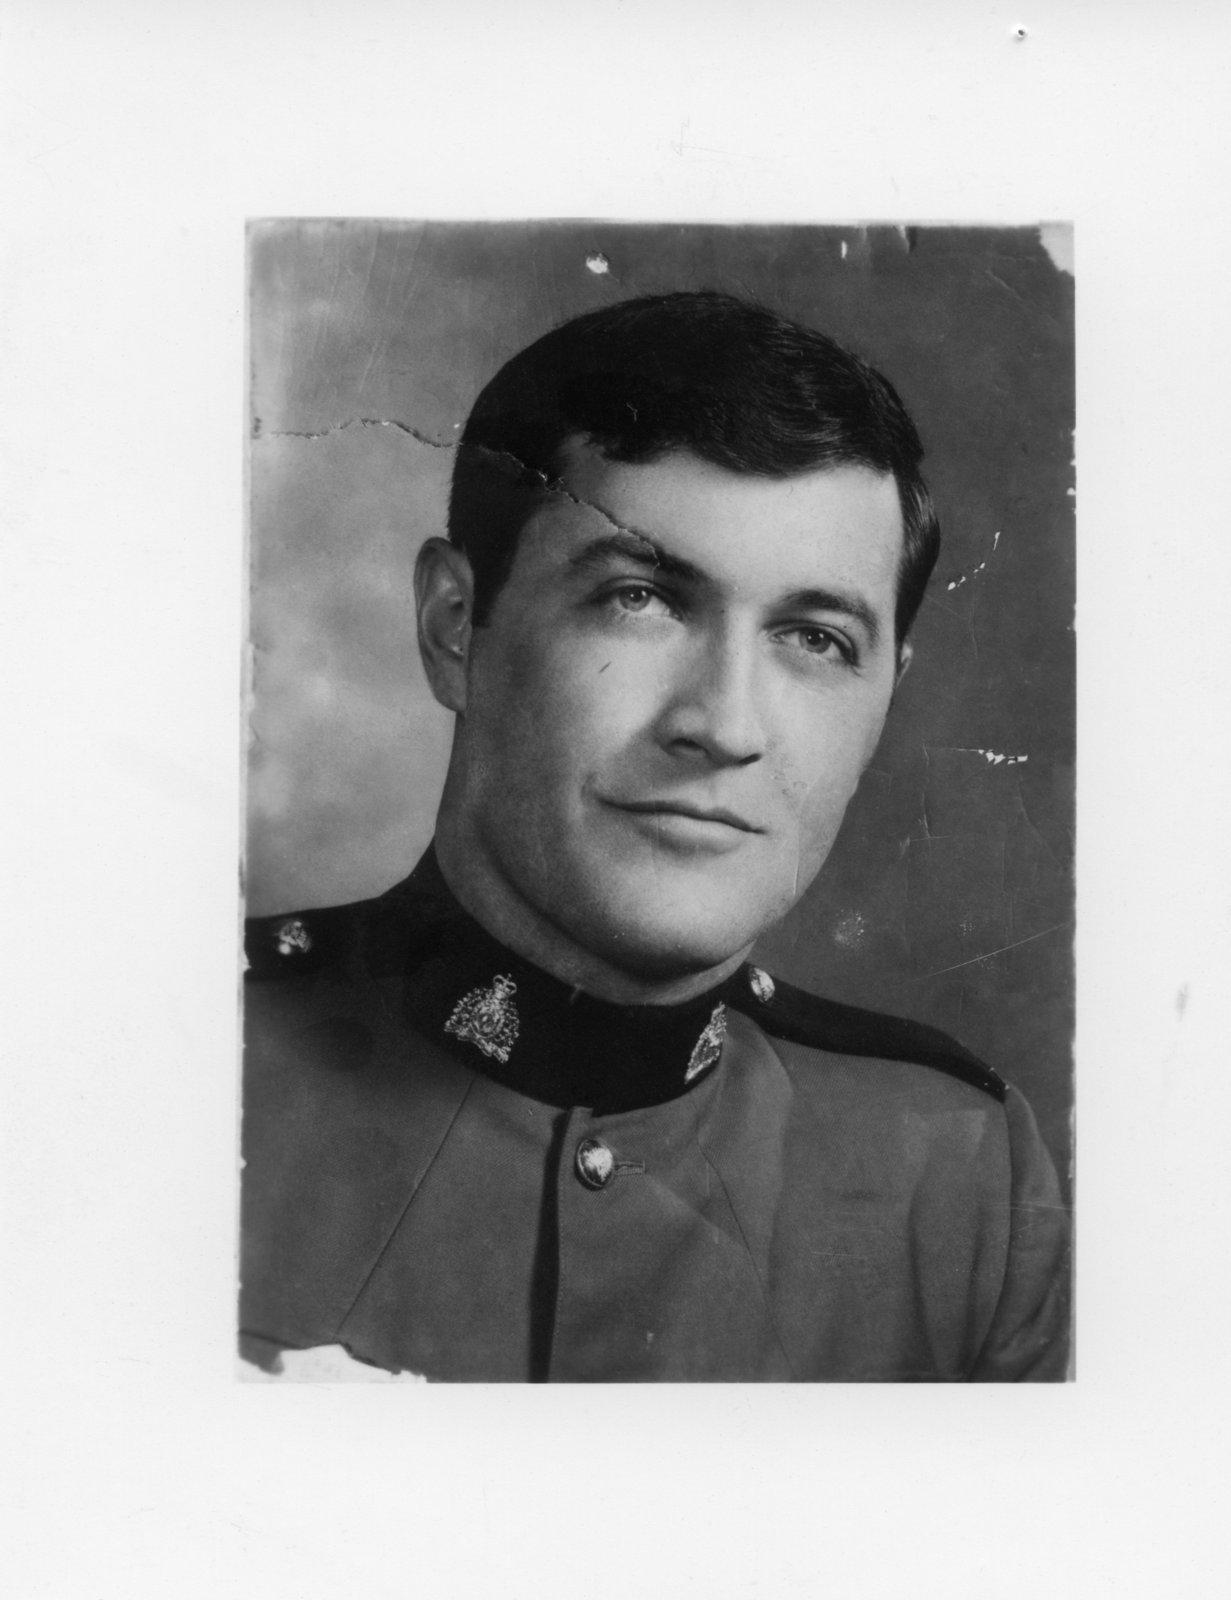 Corporal Barry Warren Lidstone